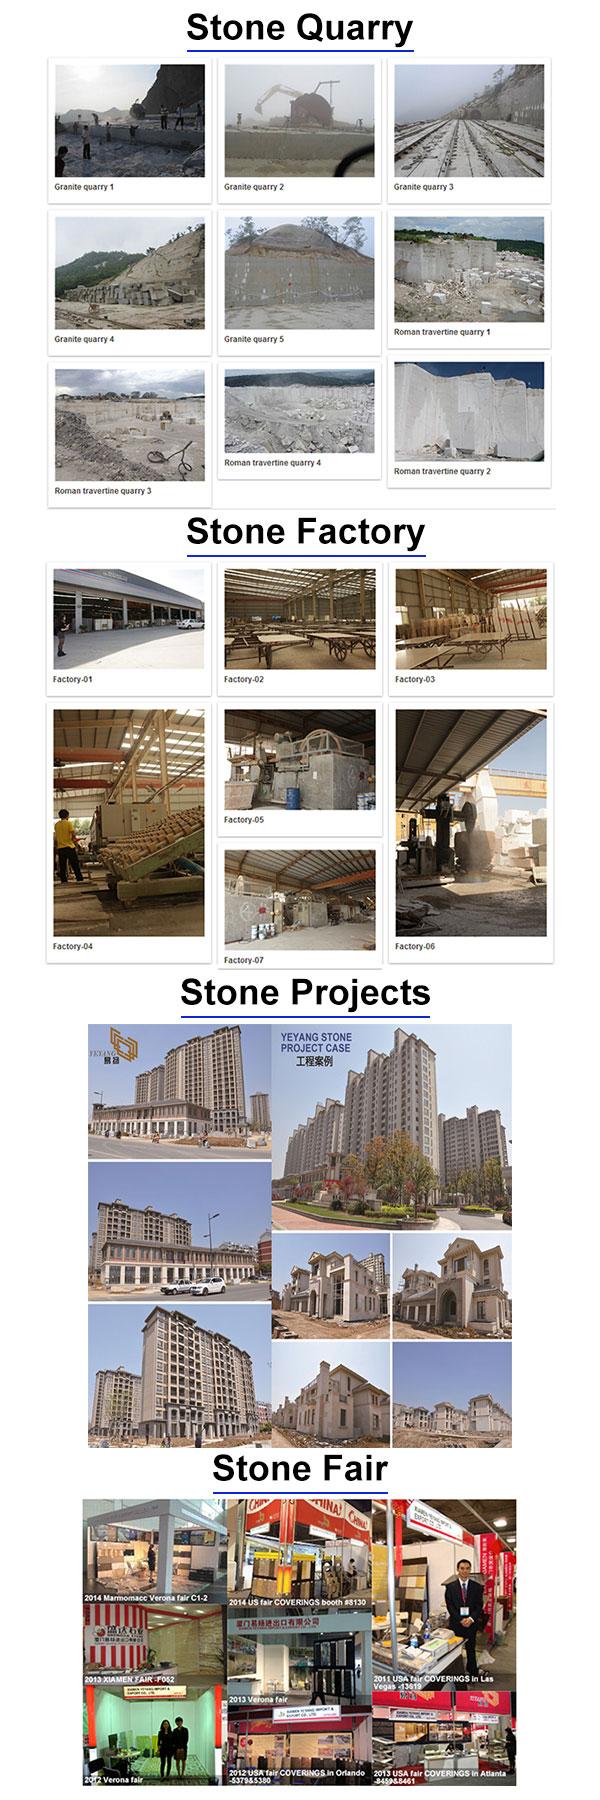 Roman Travertine Slab for Home Wall & Floor Tile or Countertops